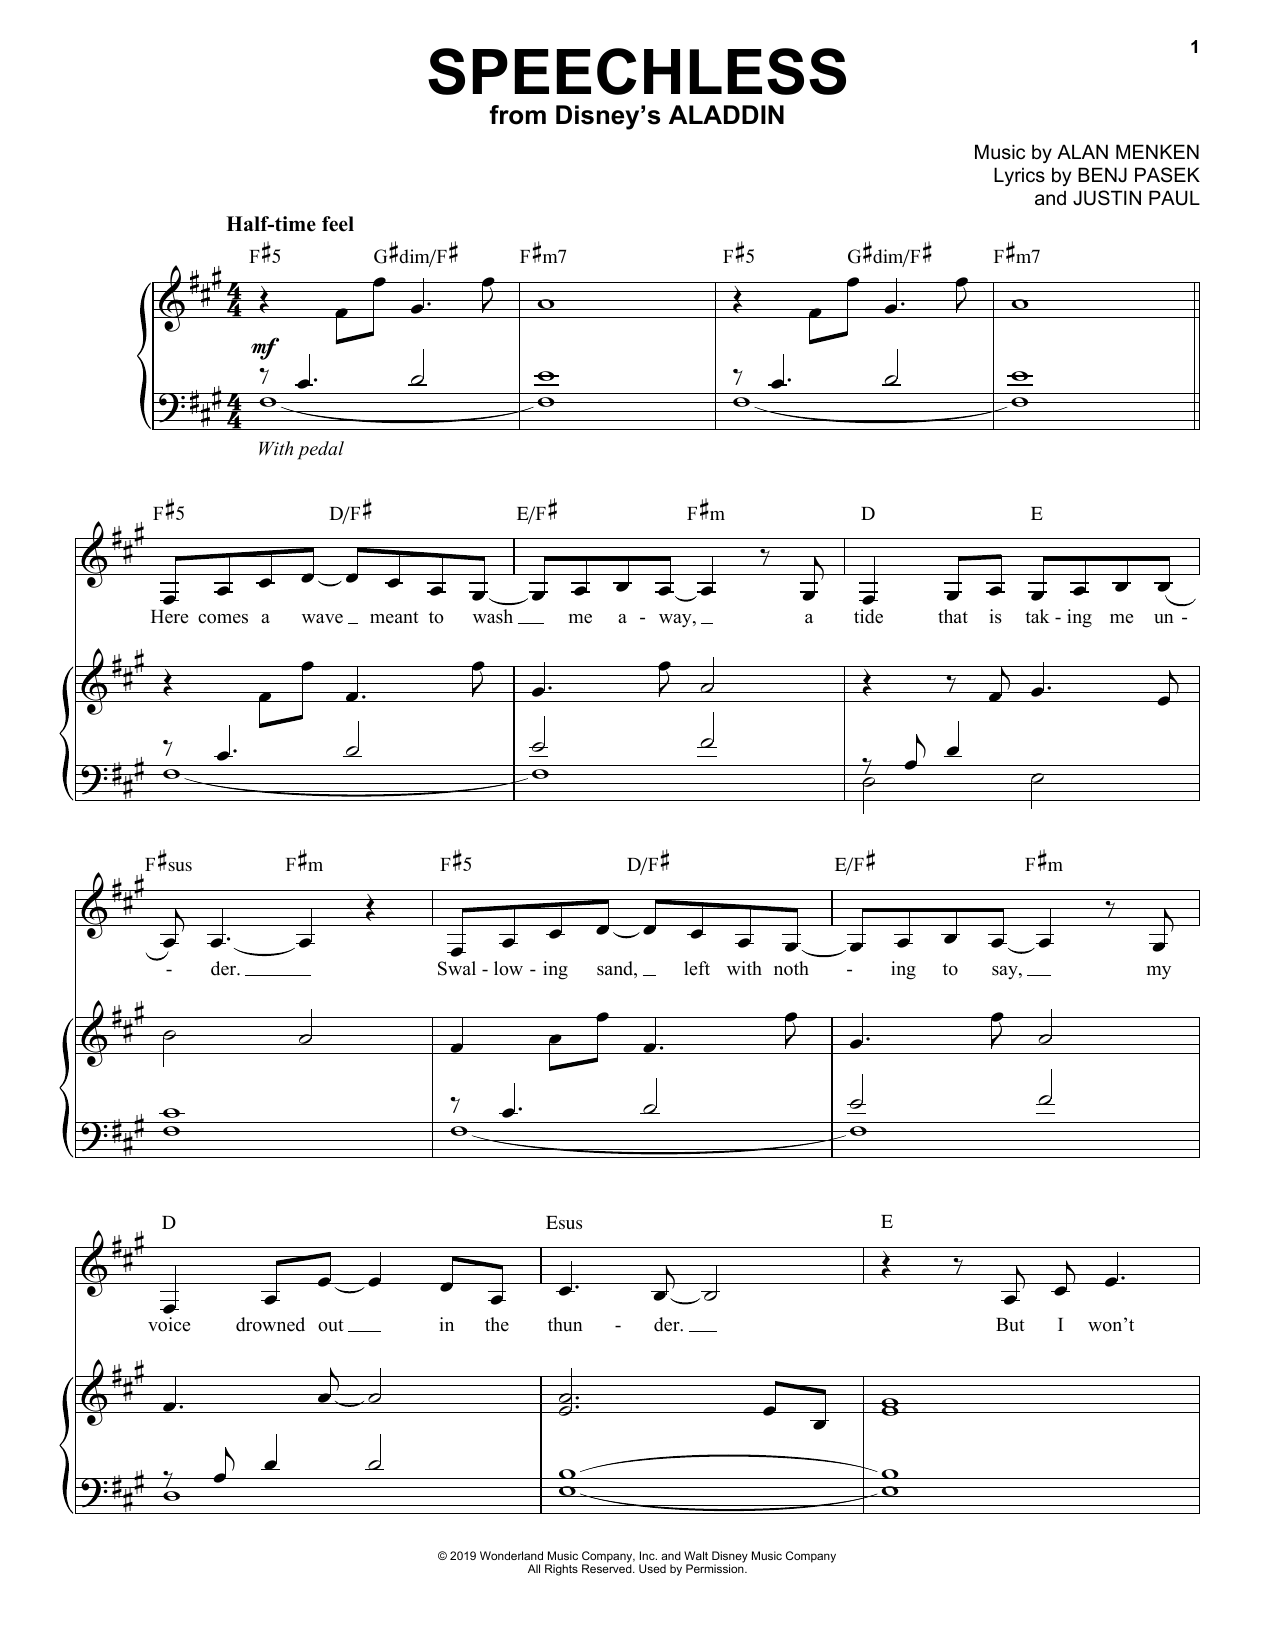 image regarding Disney Piano Sheet Music Free Printable called Speechless (against Disneys Aladdin)